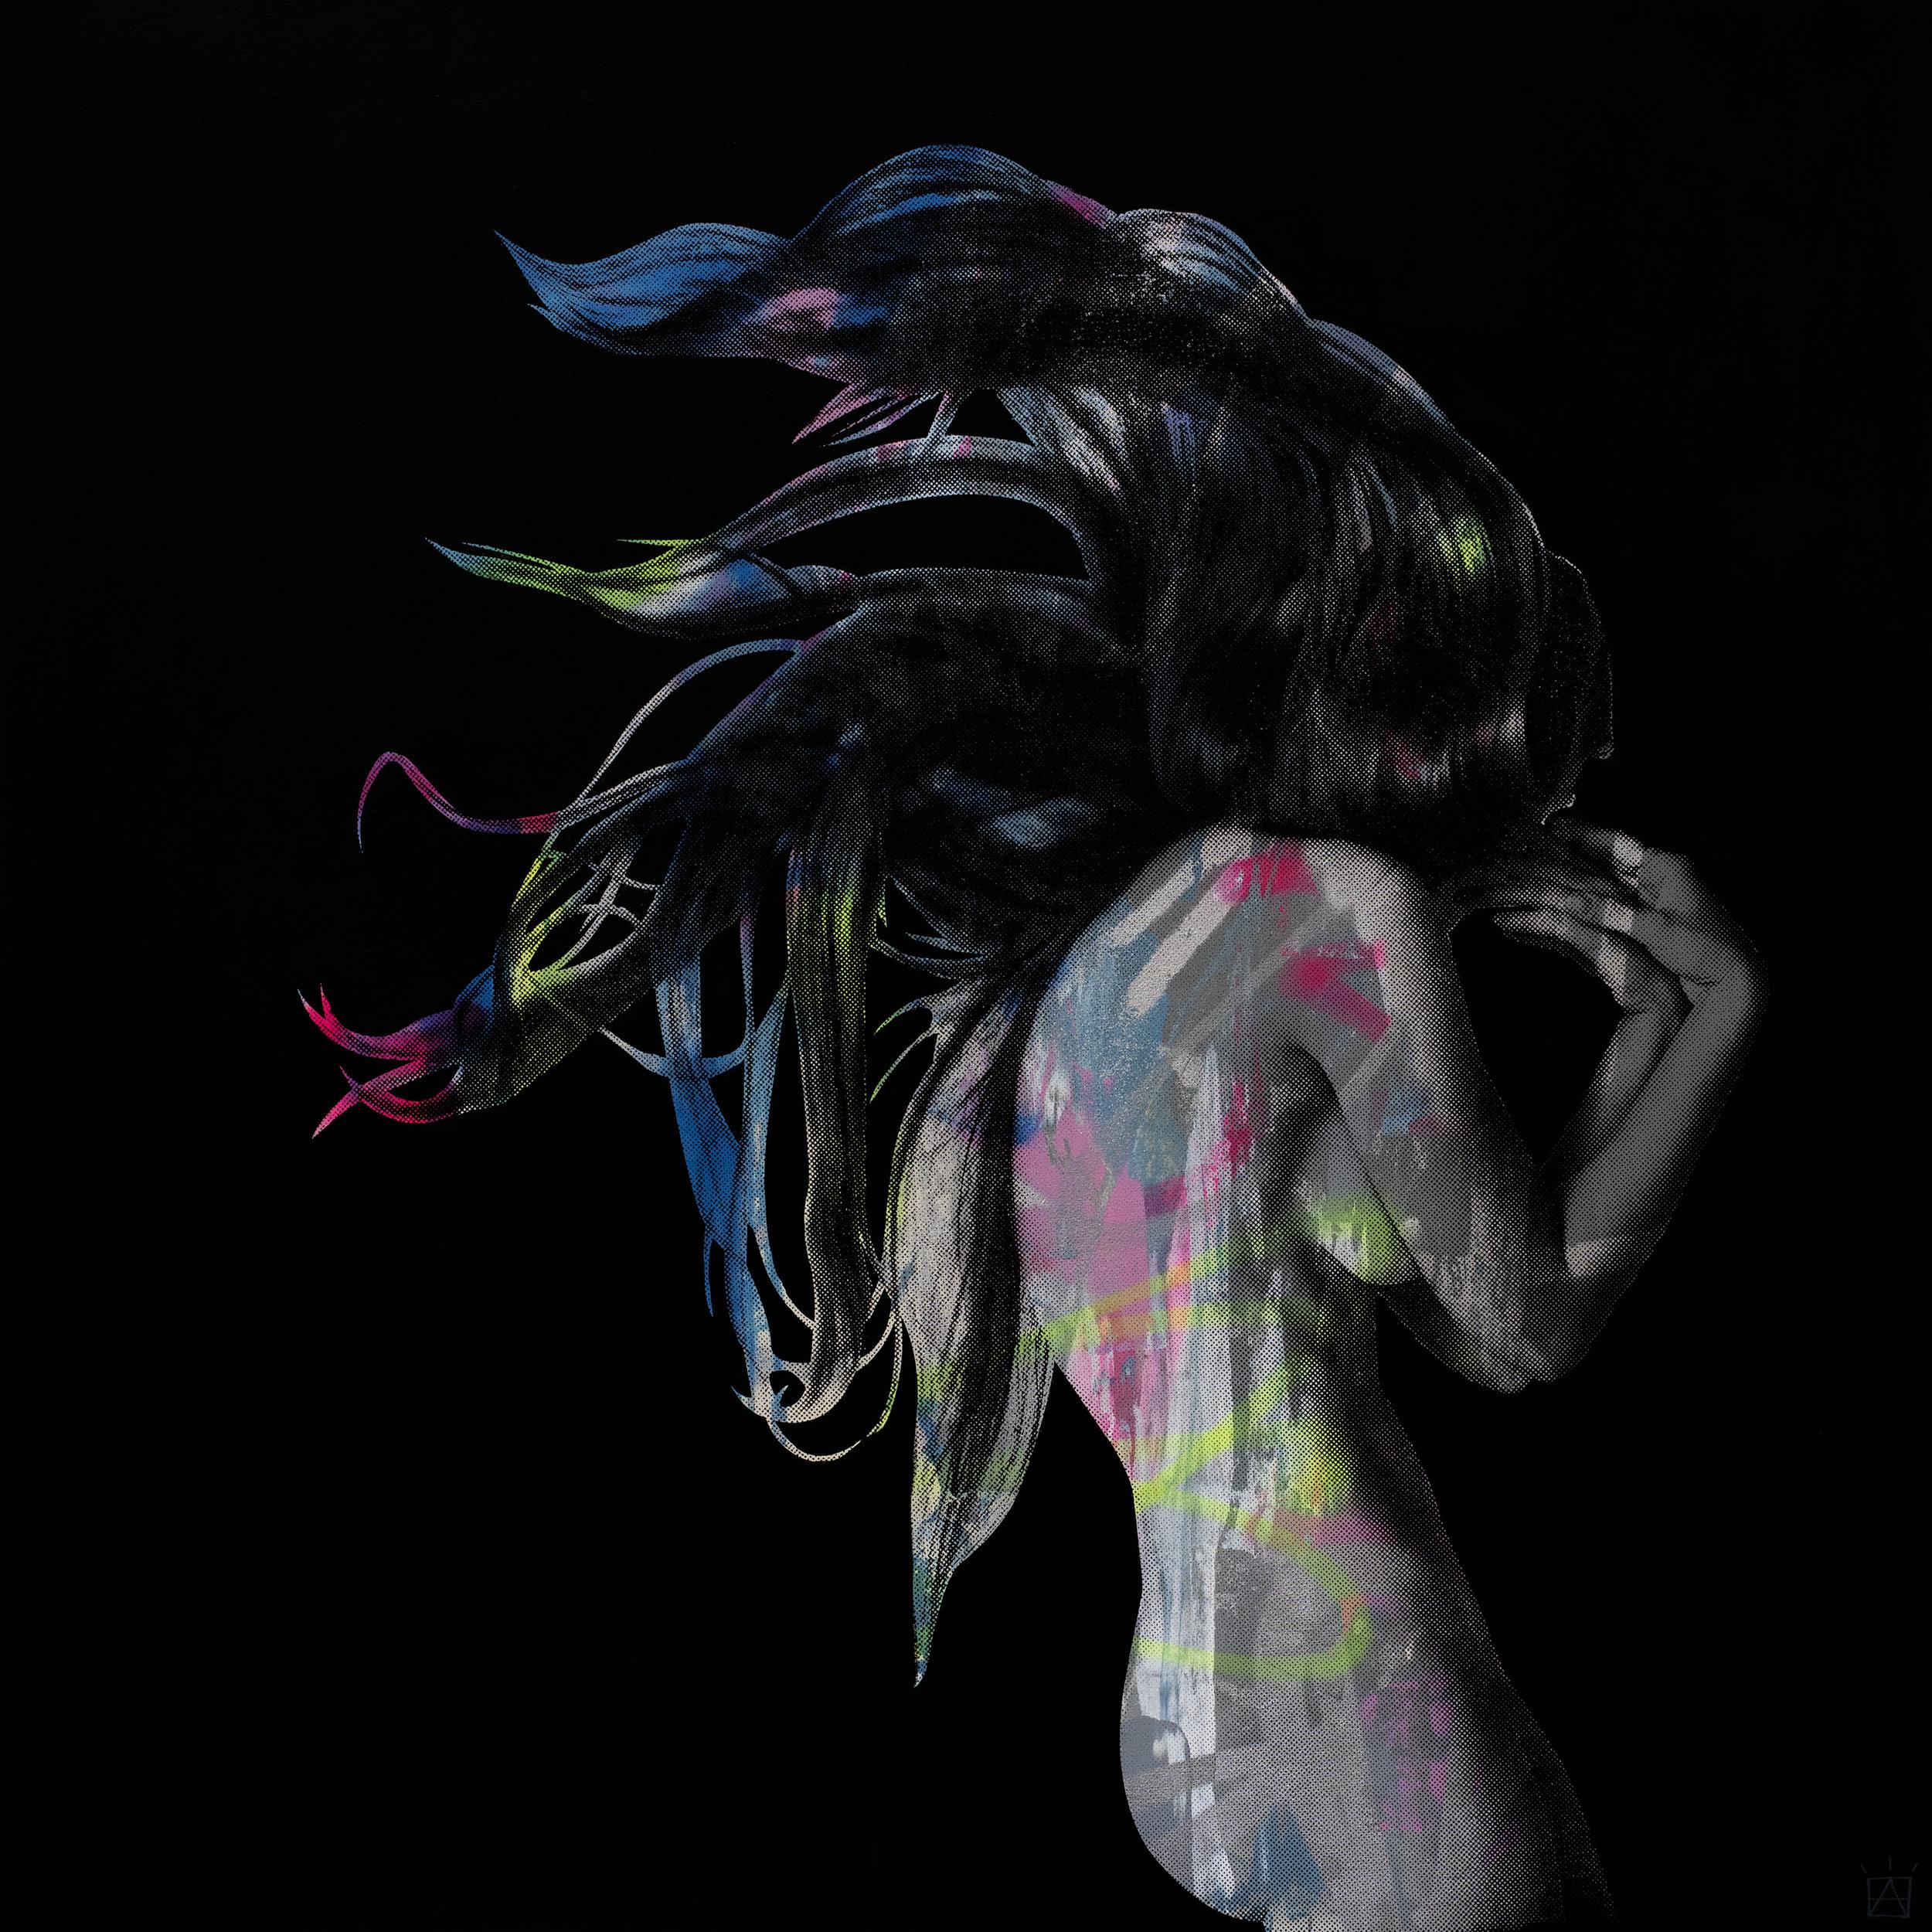 Nude-Graffiti-Eclipse-No.2-130cmX130cmX4.5cm.jpg